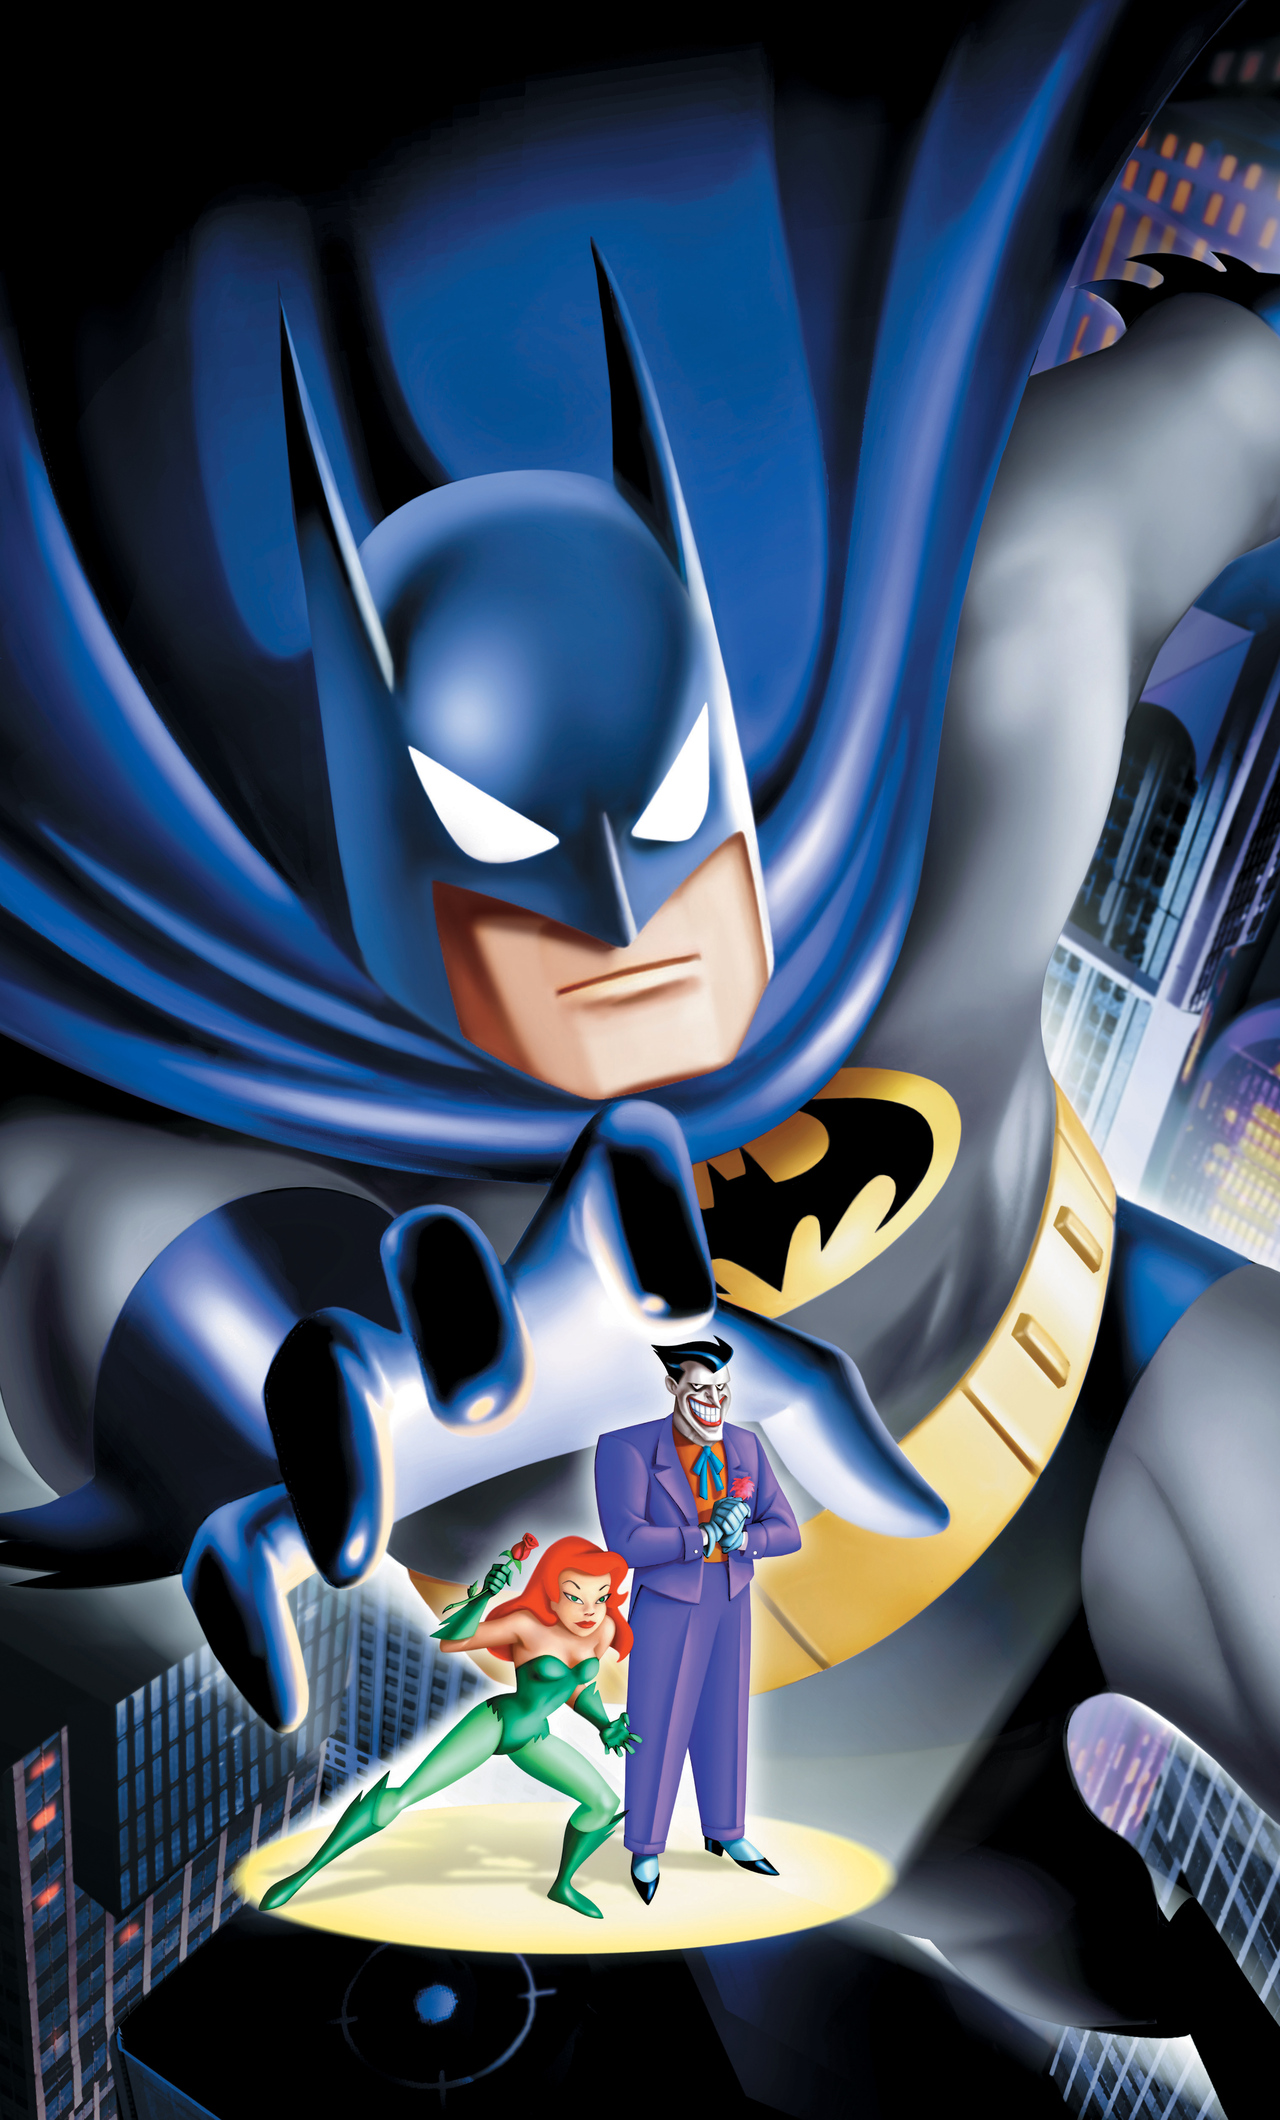 1280x2120 Batman The Animated Series 4k Iphone 6 Hd 4k